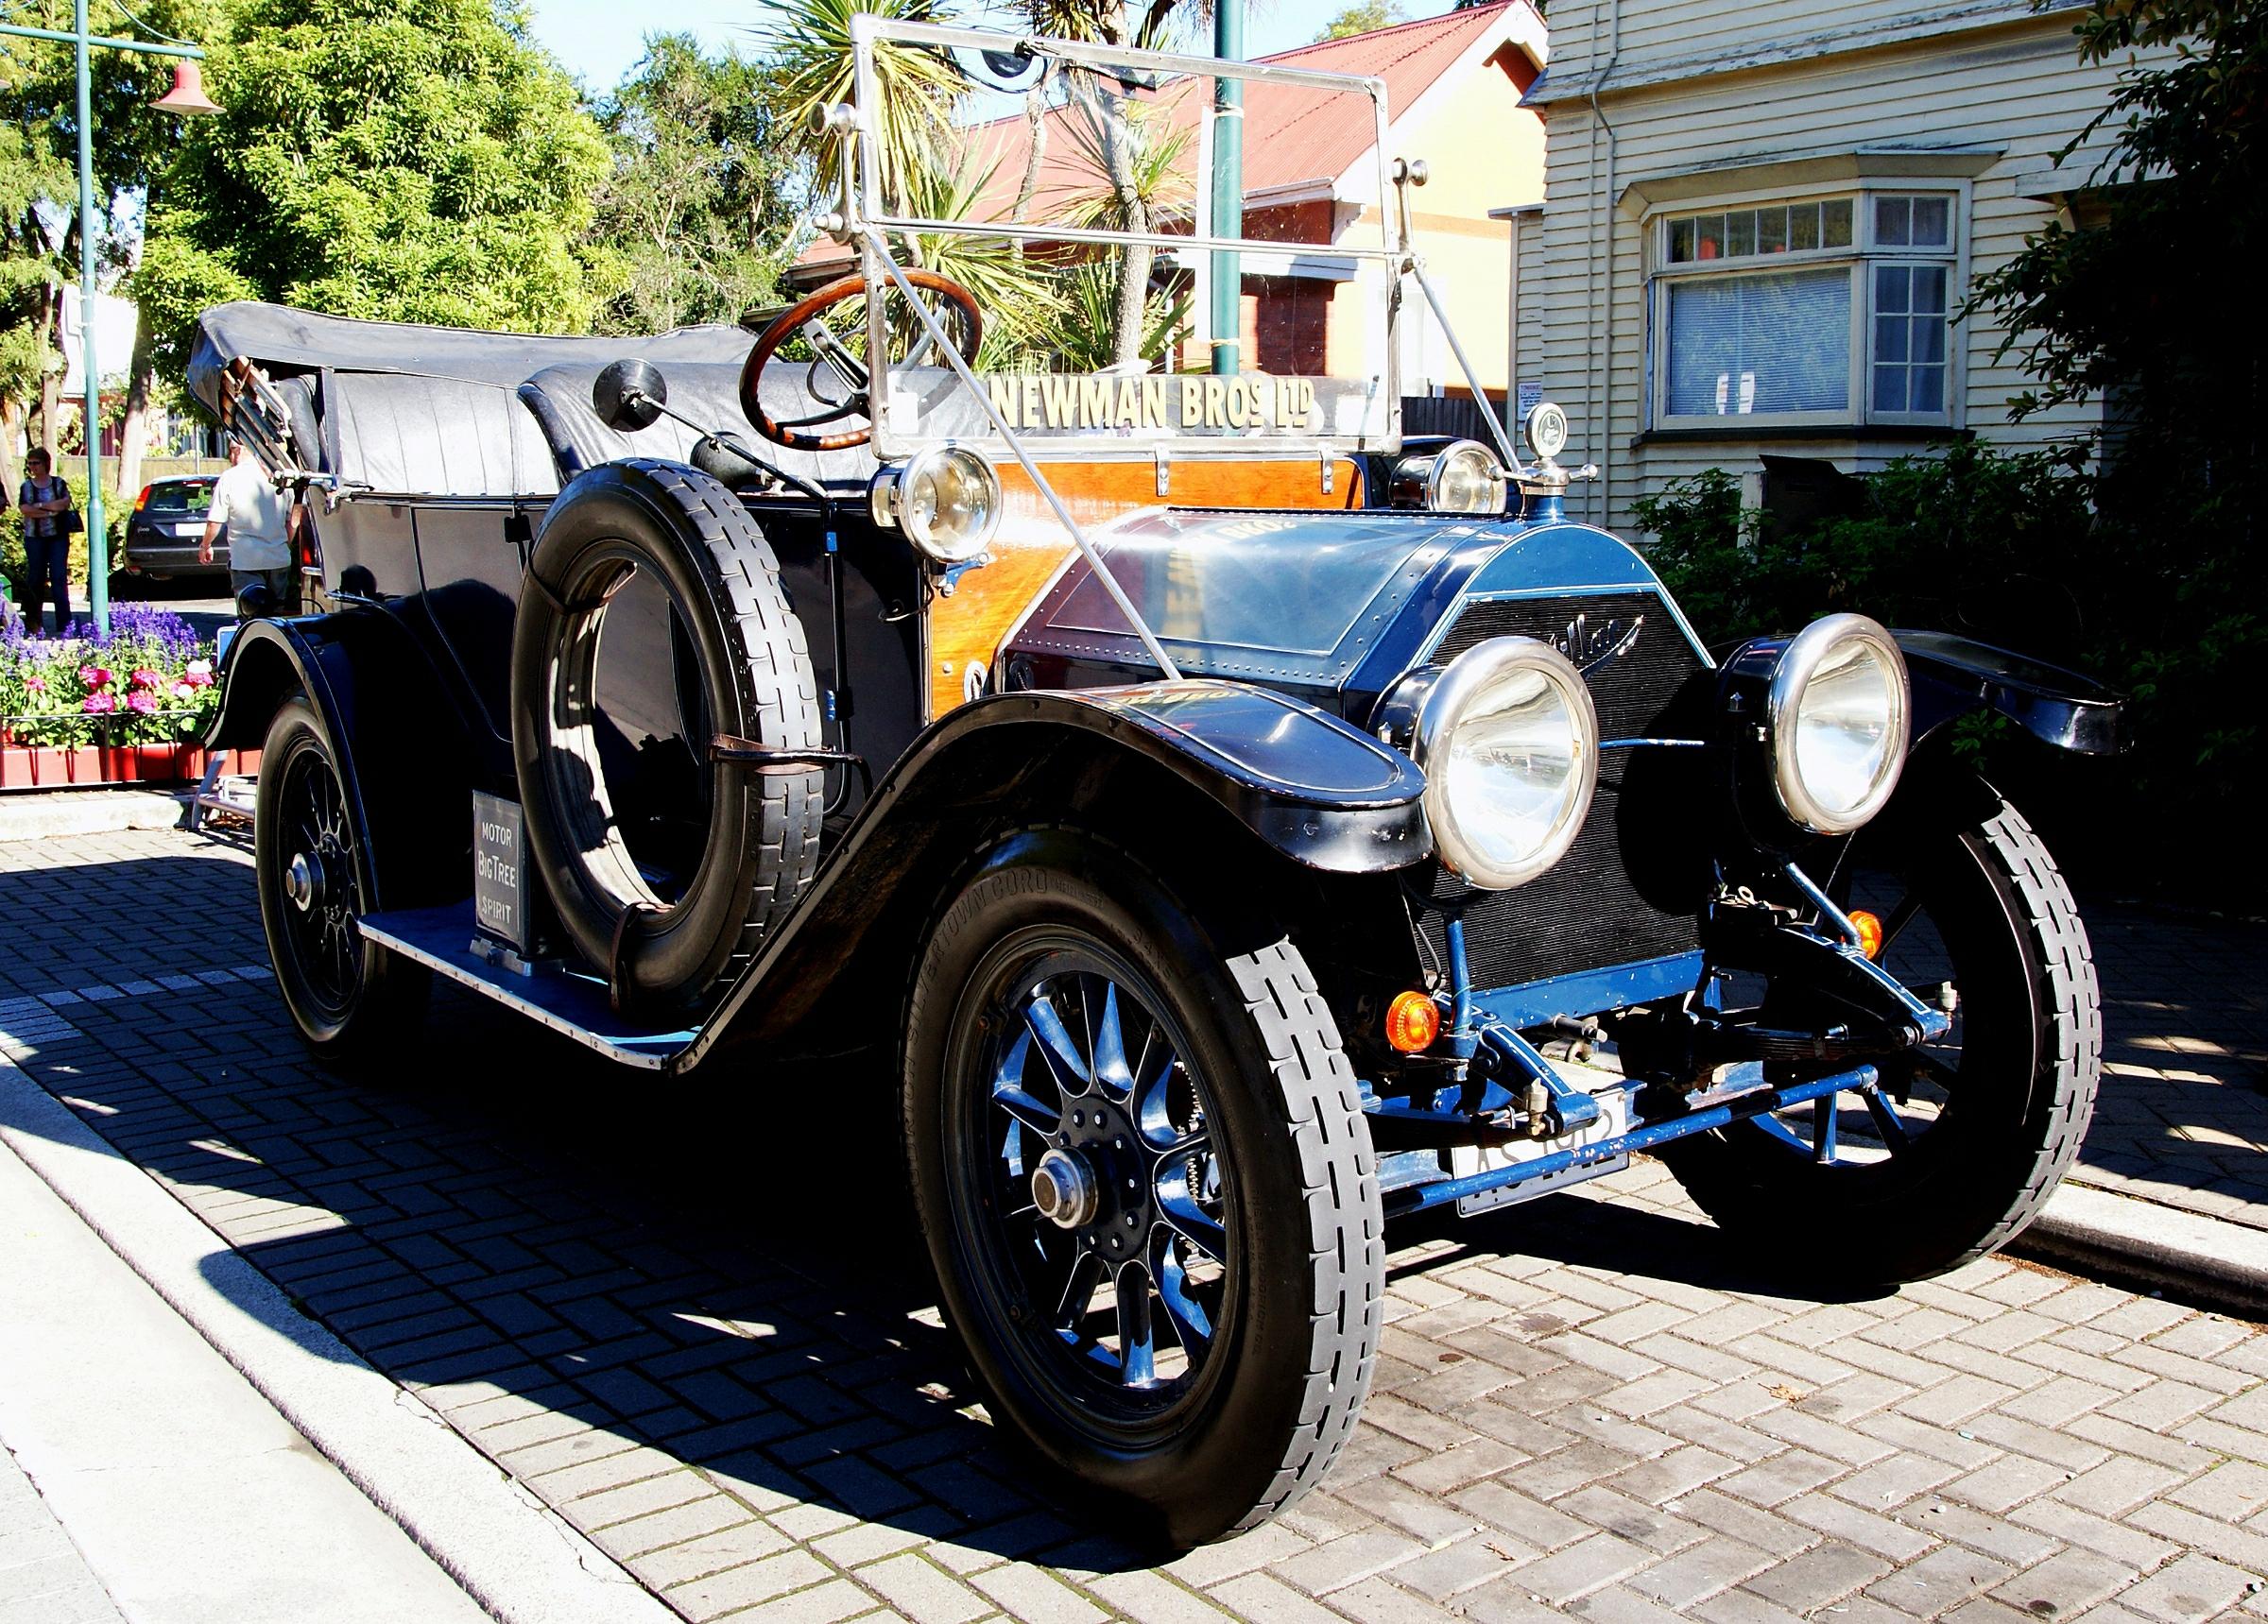 Free Images : motor vehicle, vintage car, oldcars, oldcar, classic ...